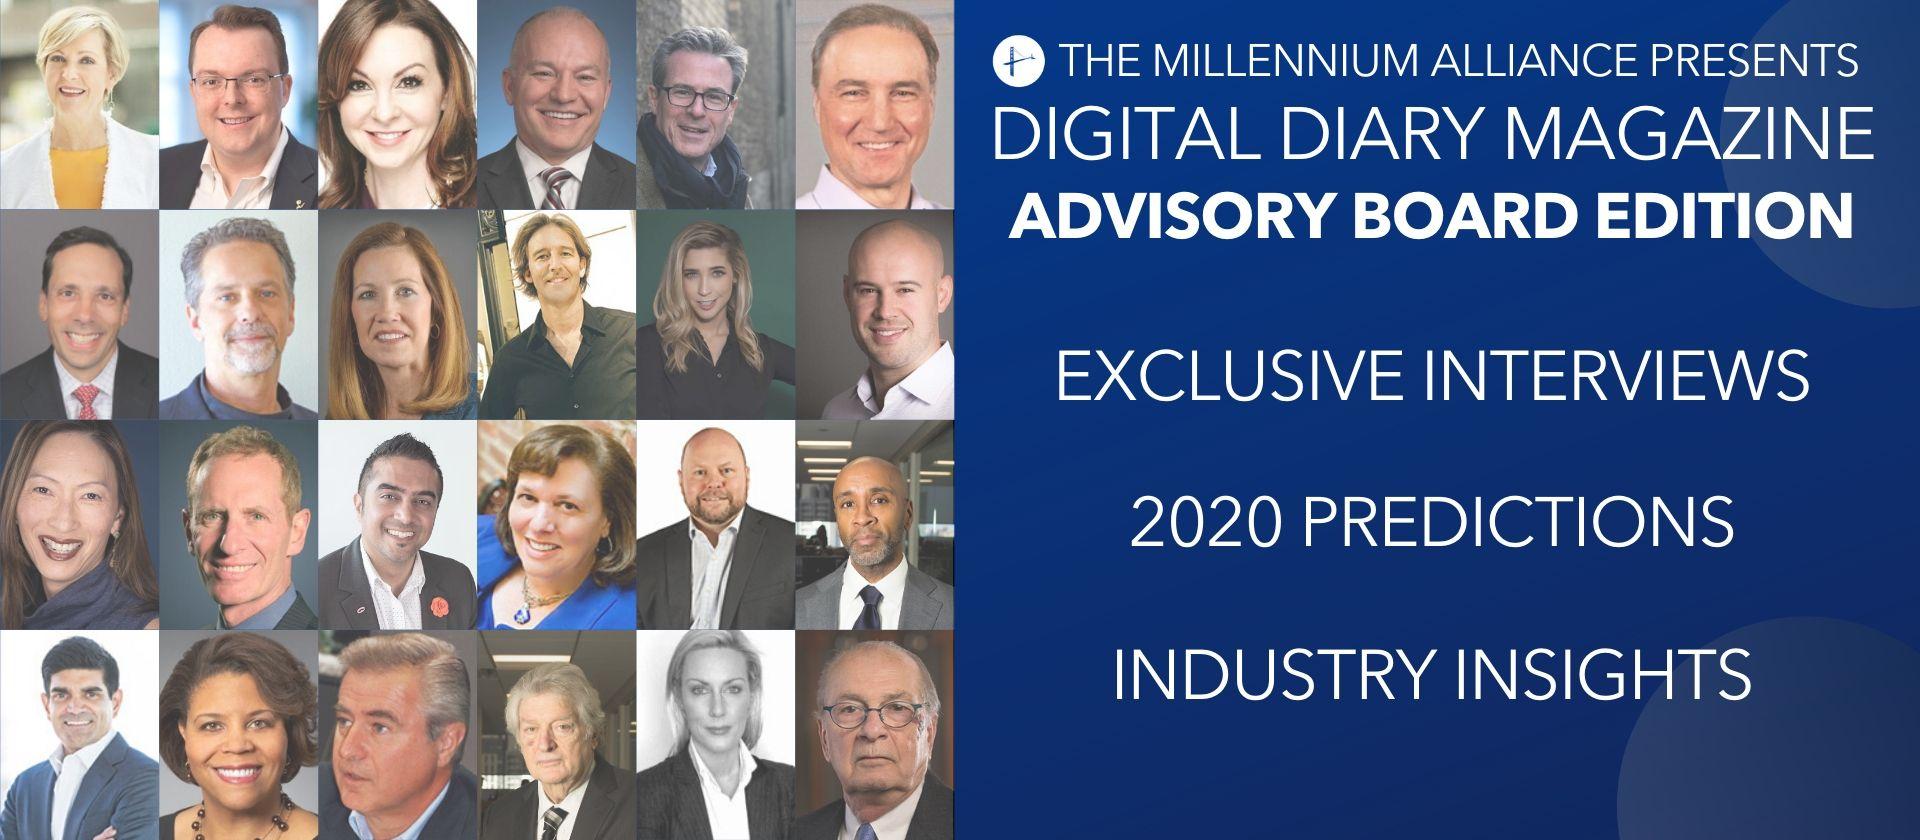 Digital Diary 2020 Advisory Board Edition Millennium Alliance